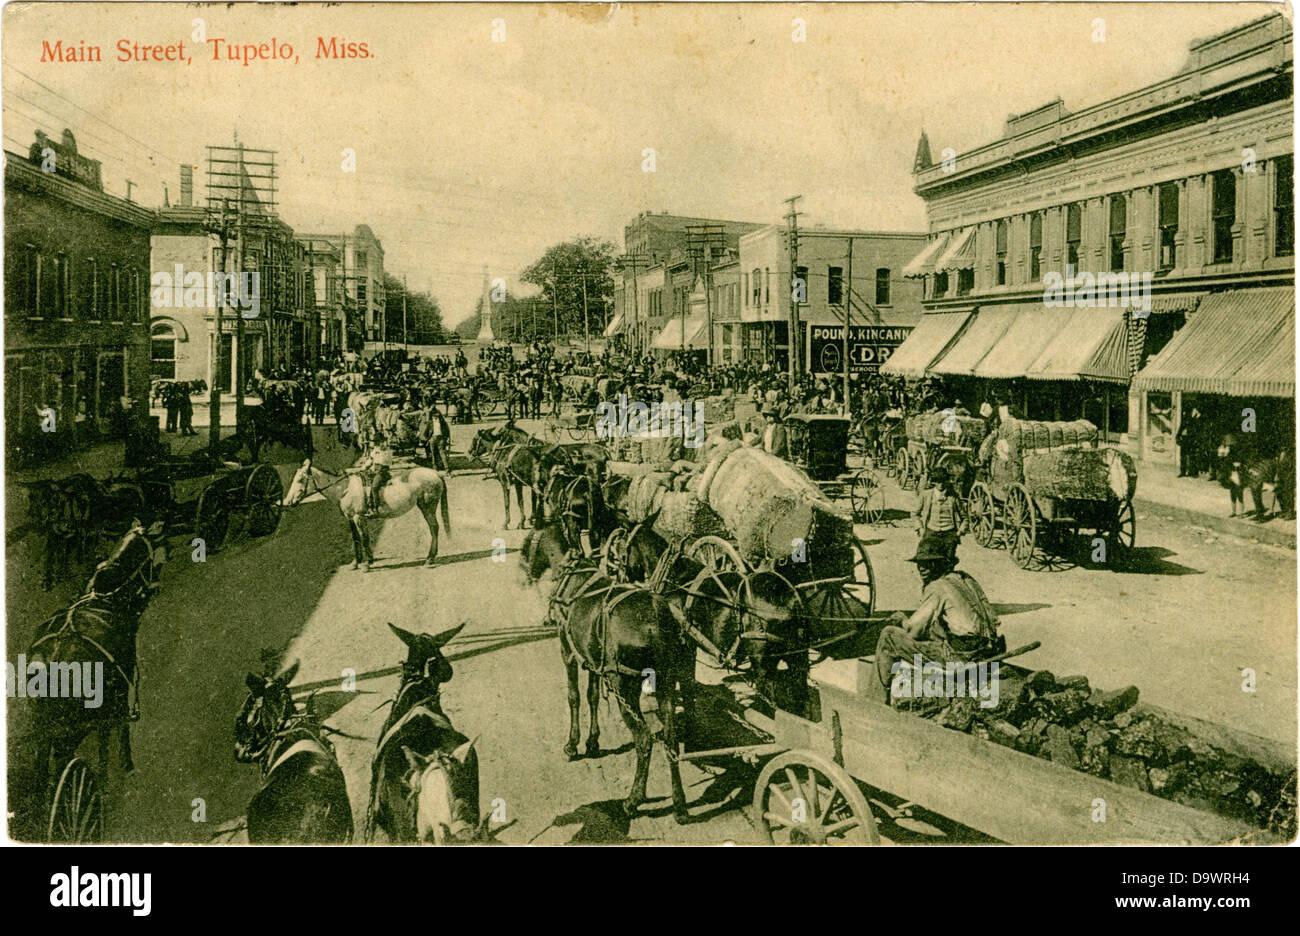 Main Street, Tupelo, Miss. - Stock Image